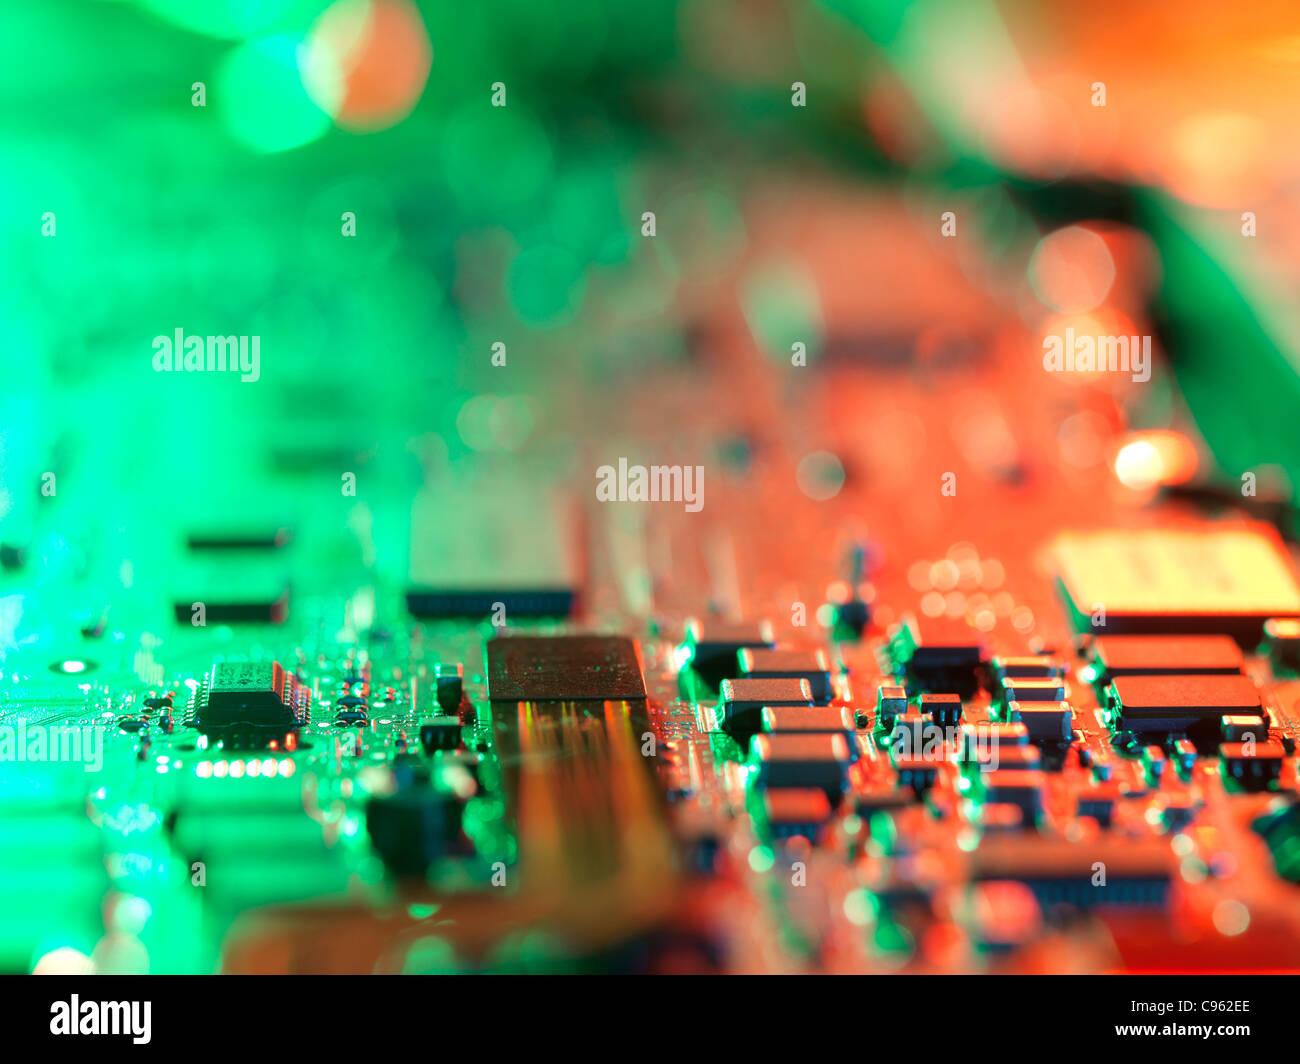 Laptop circuit board. - Stock Image